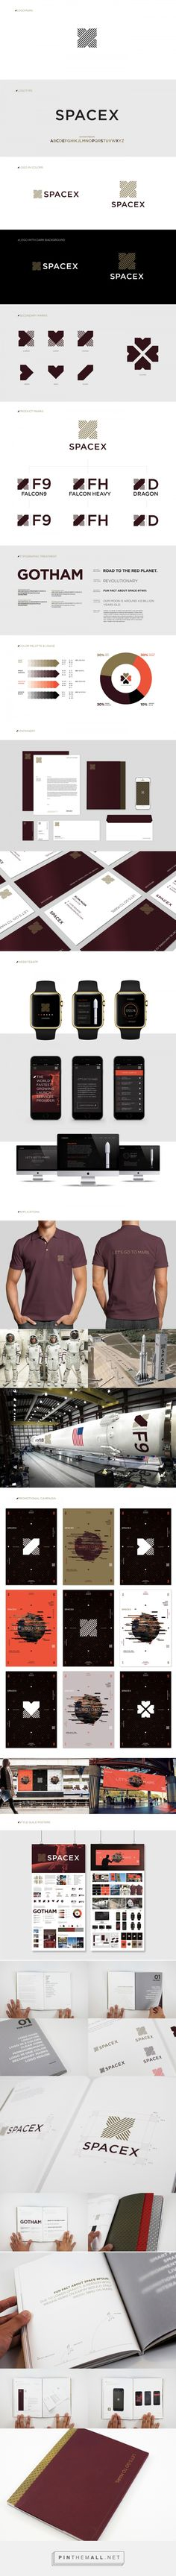 SpaceX Rebranding on Behance - created via https://pinthemall.net